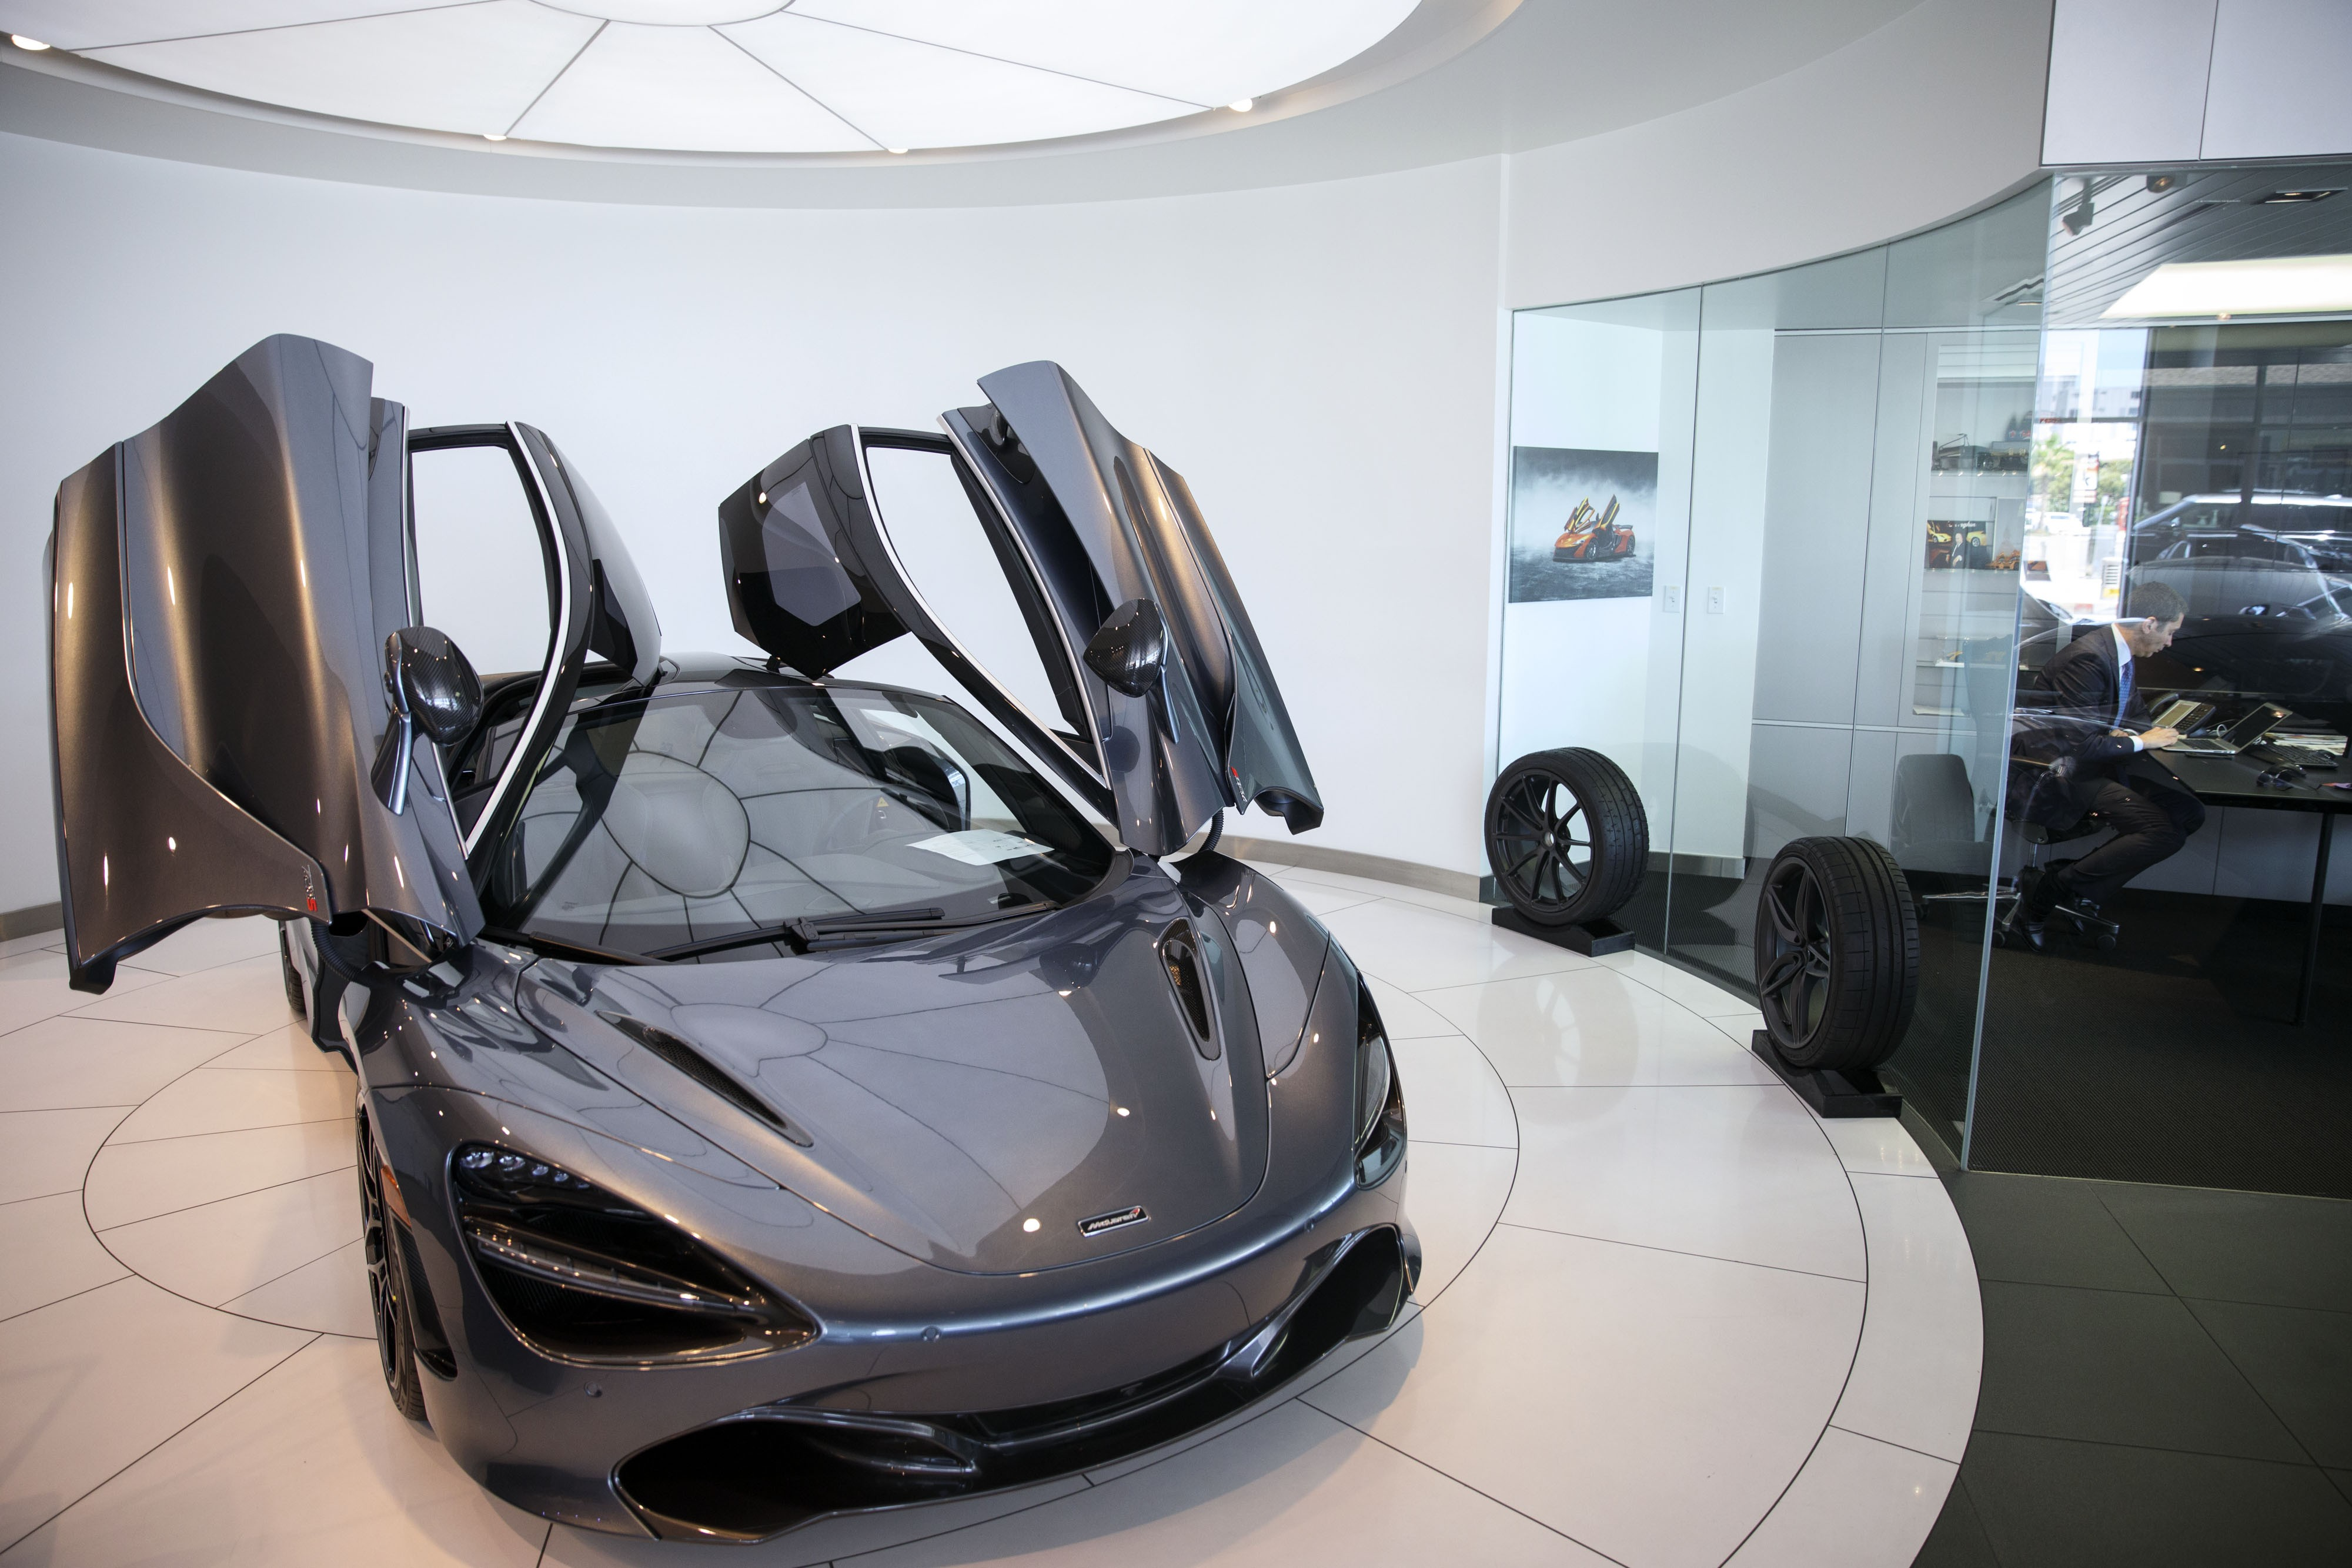 Pebble Beach car show is set to feature Bugatti's Divo, Porsche's